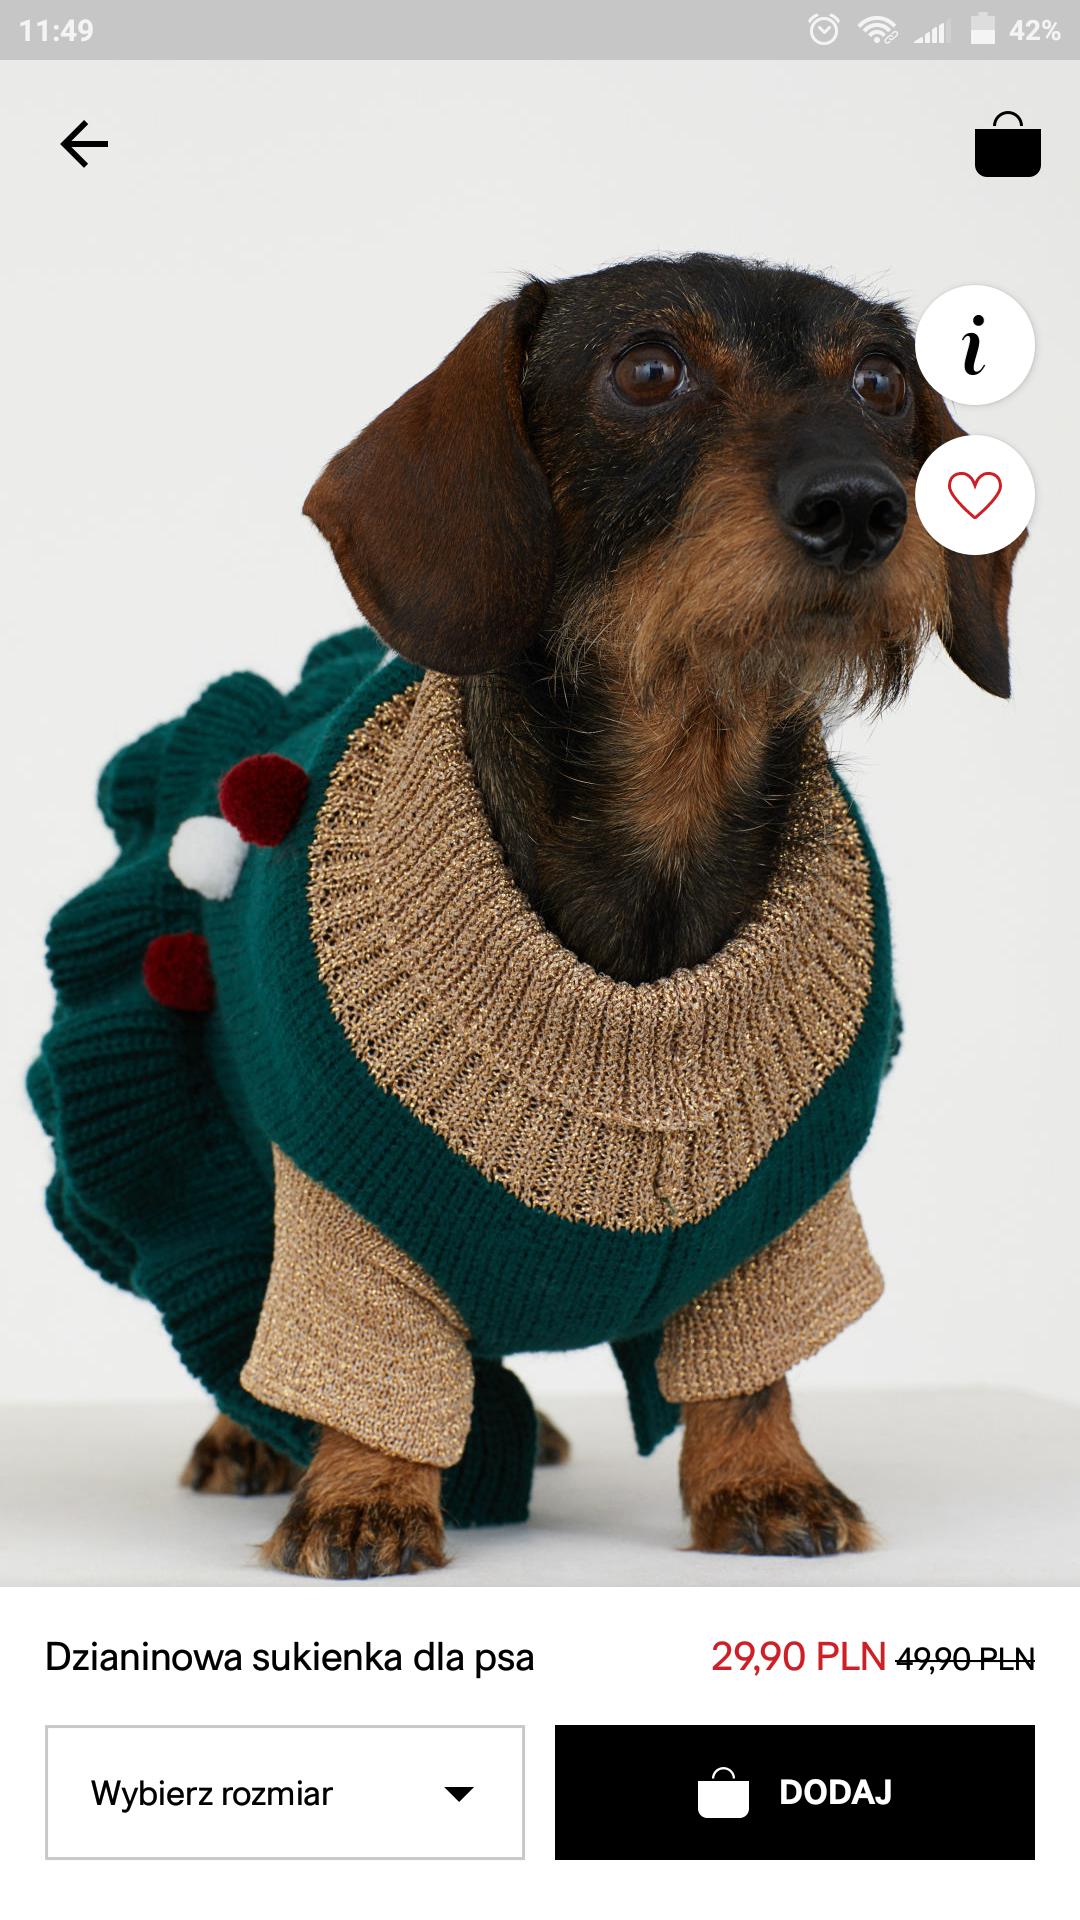 Sukienka dla psa h&m ;)